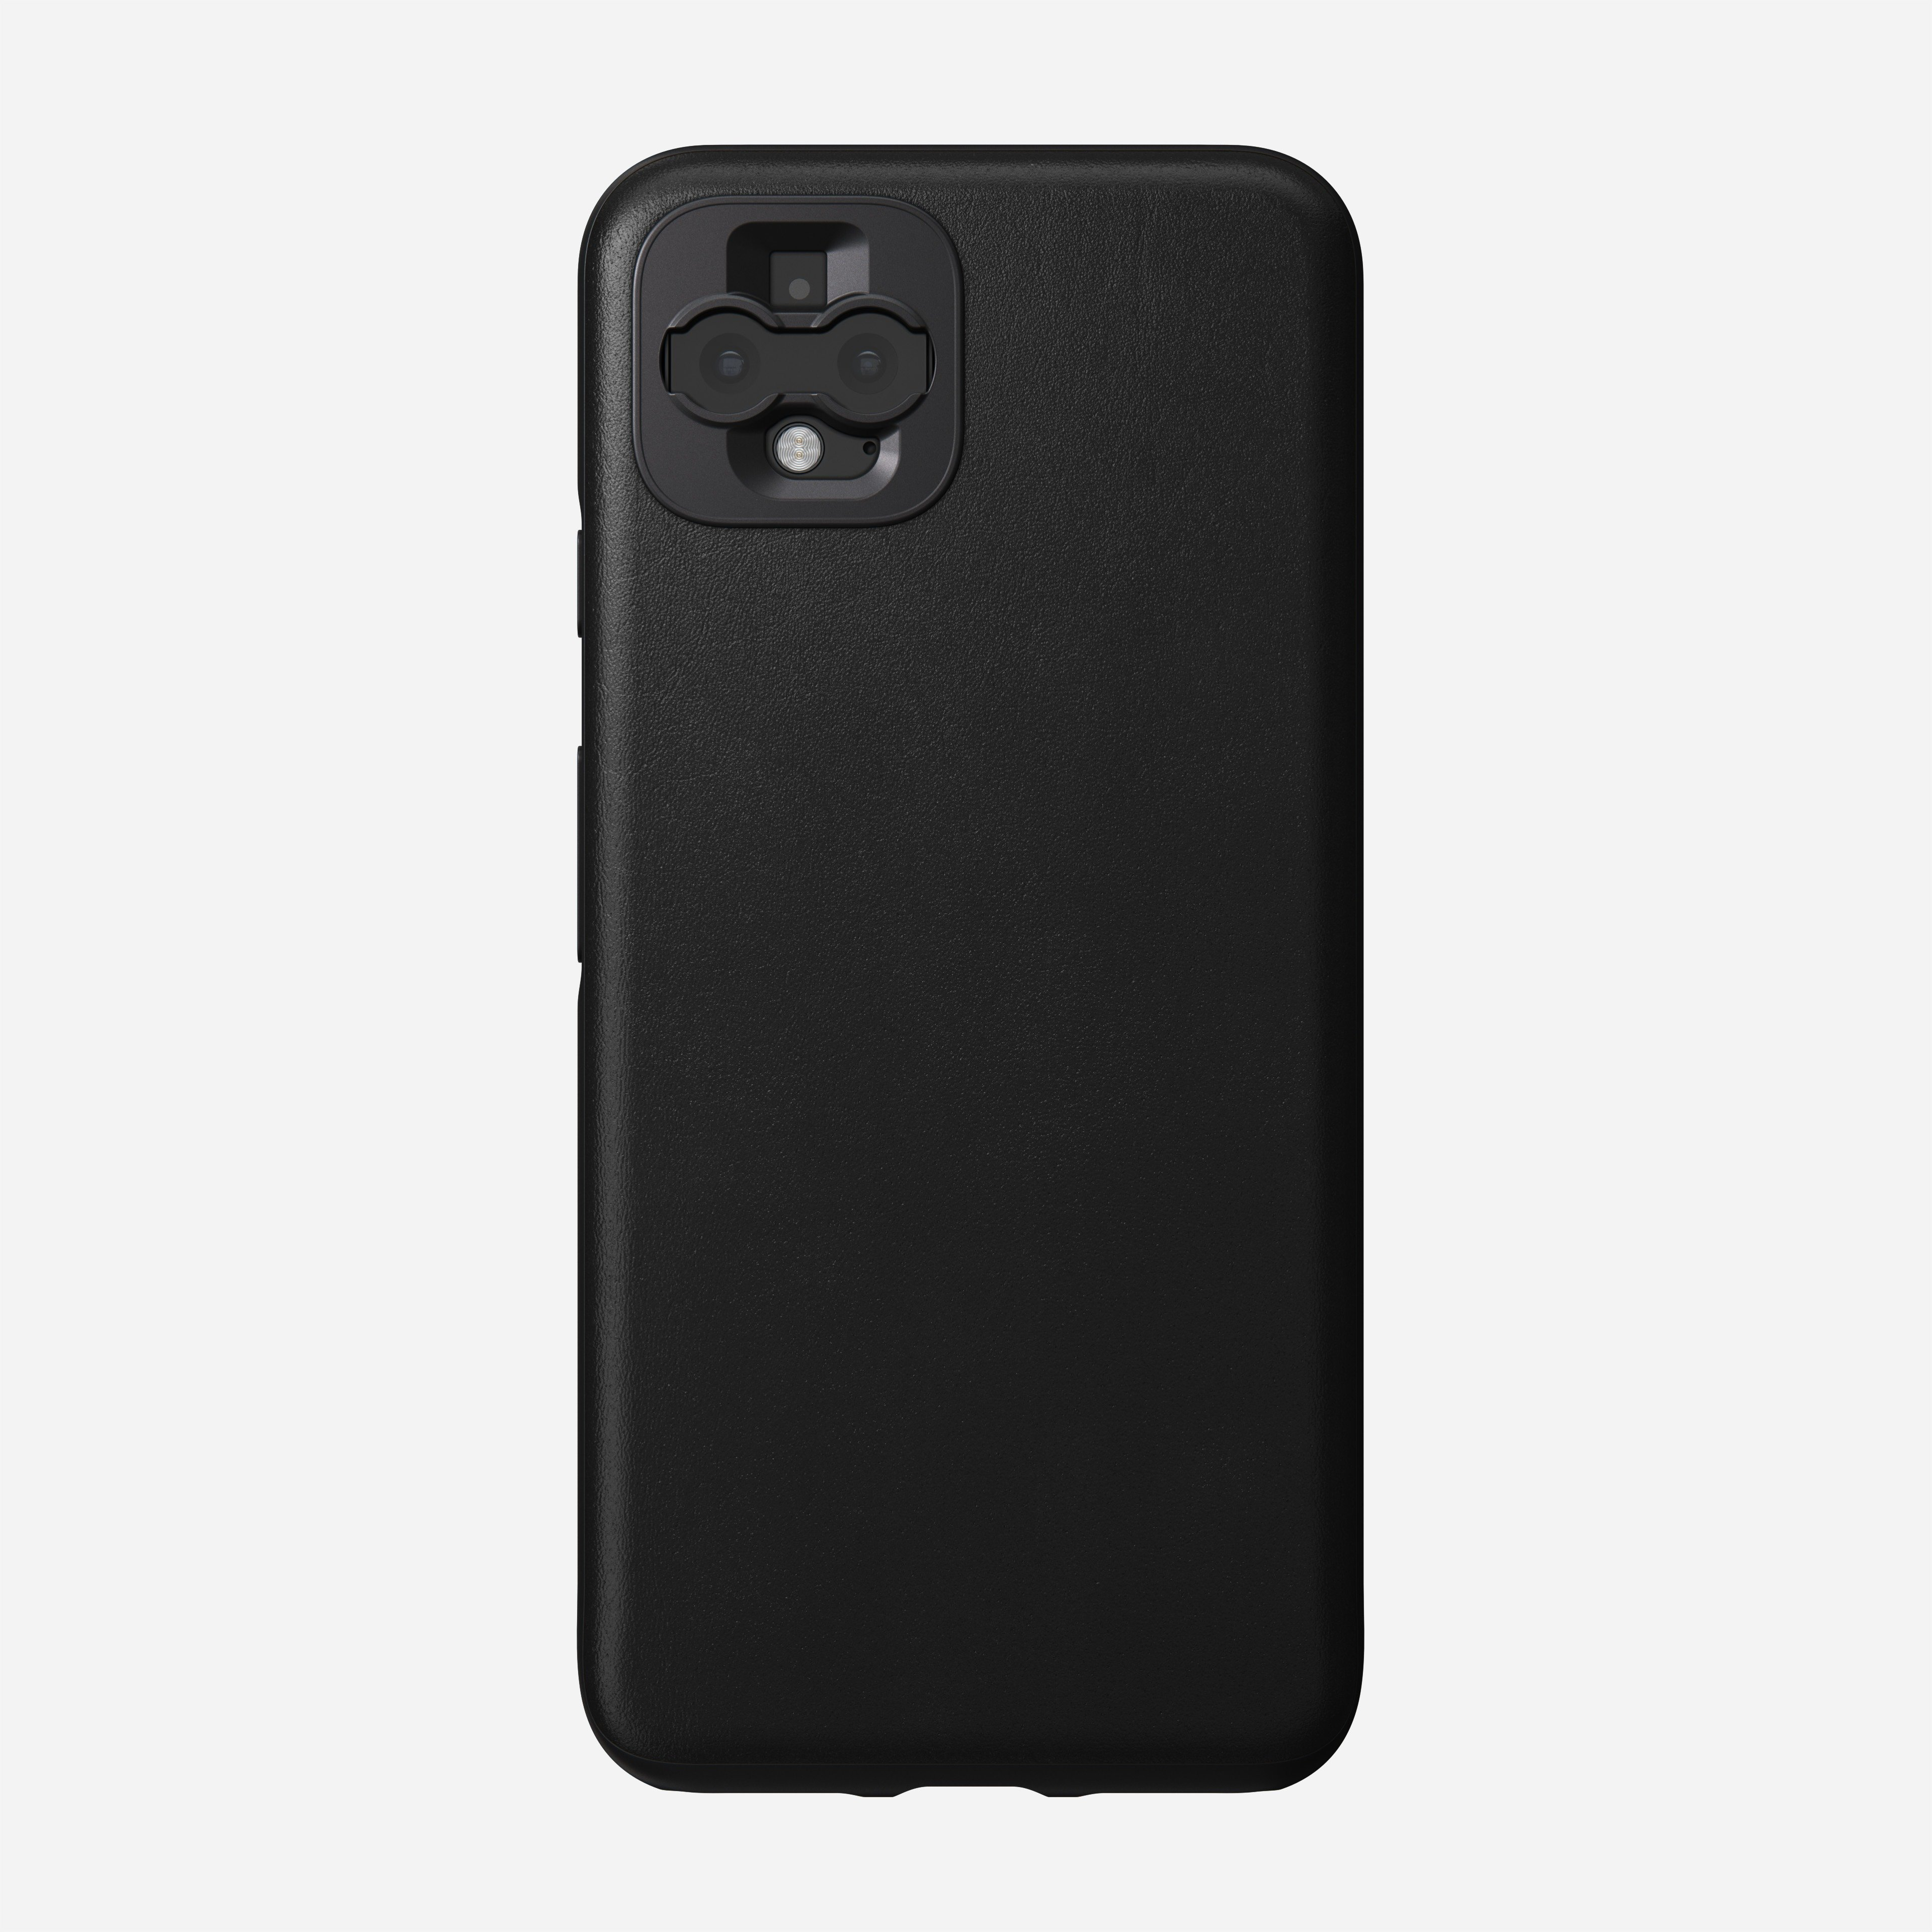 Rugged case black moment pixel 4